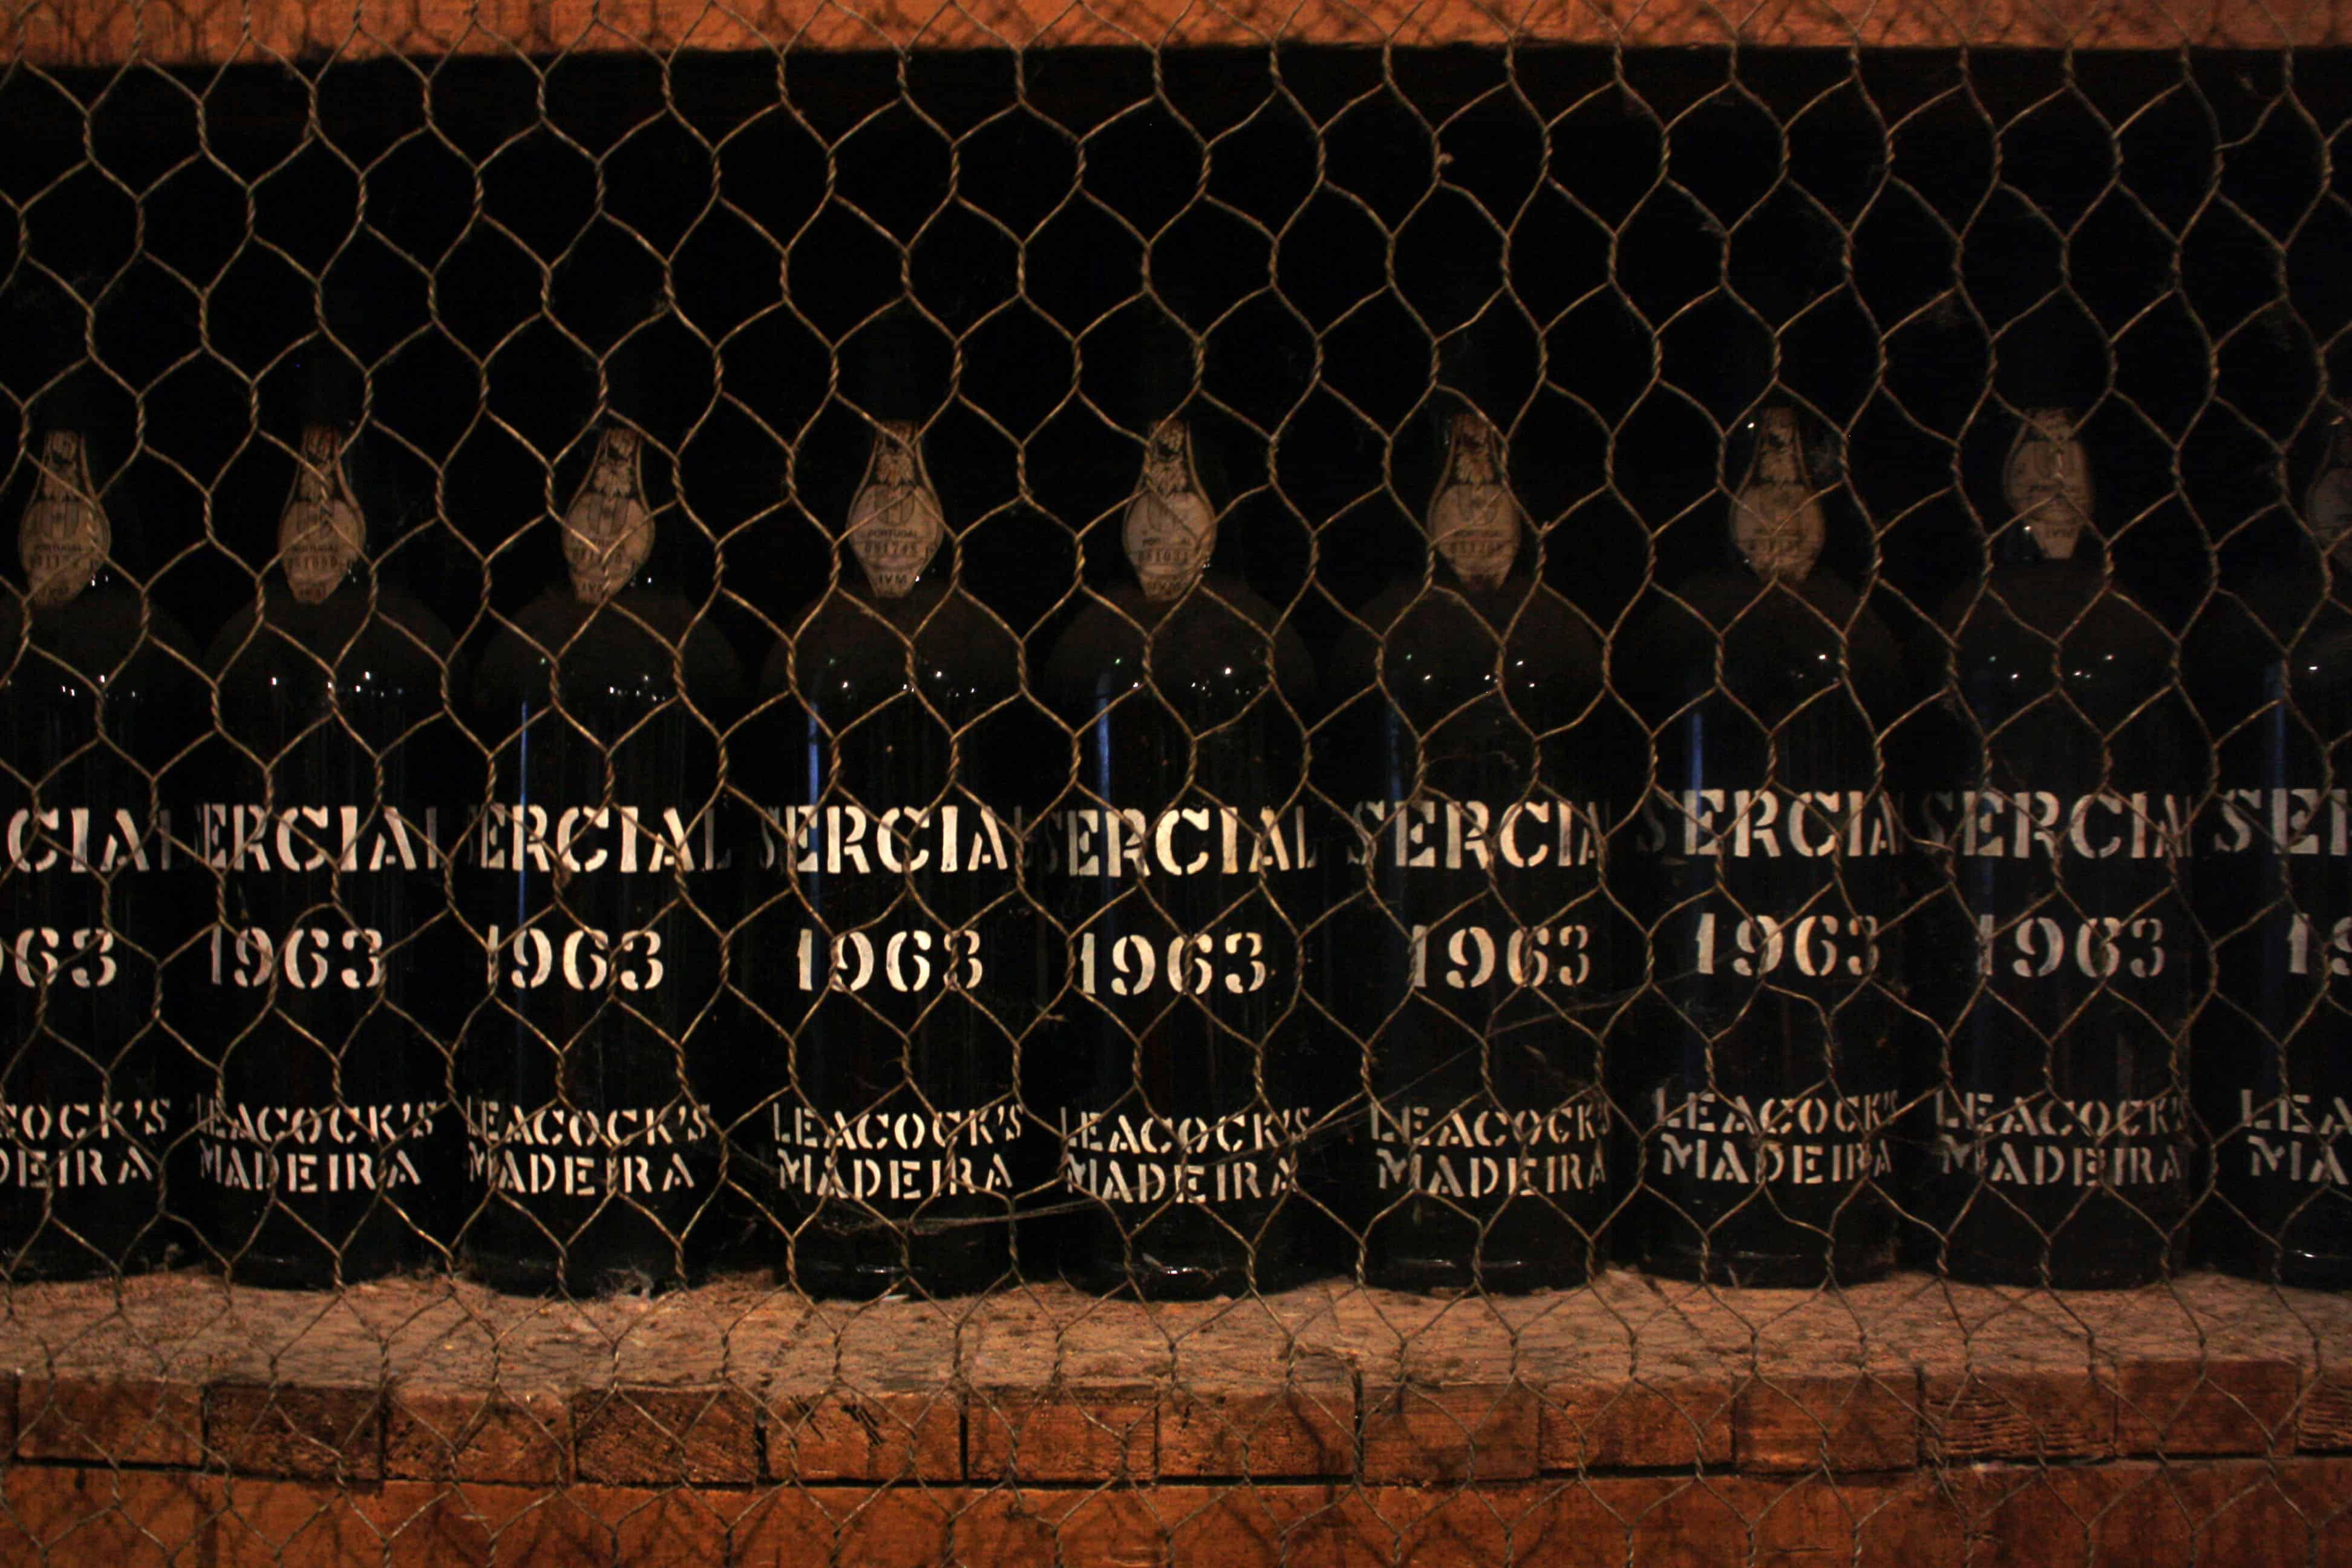 Bottles of Madeira wine, Blandy's